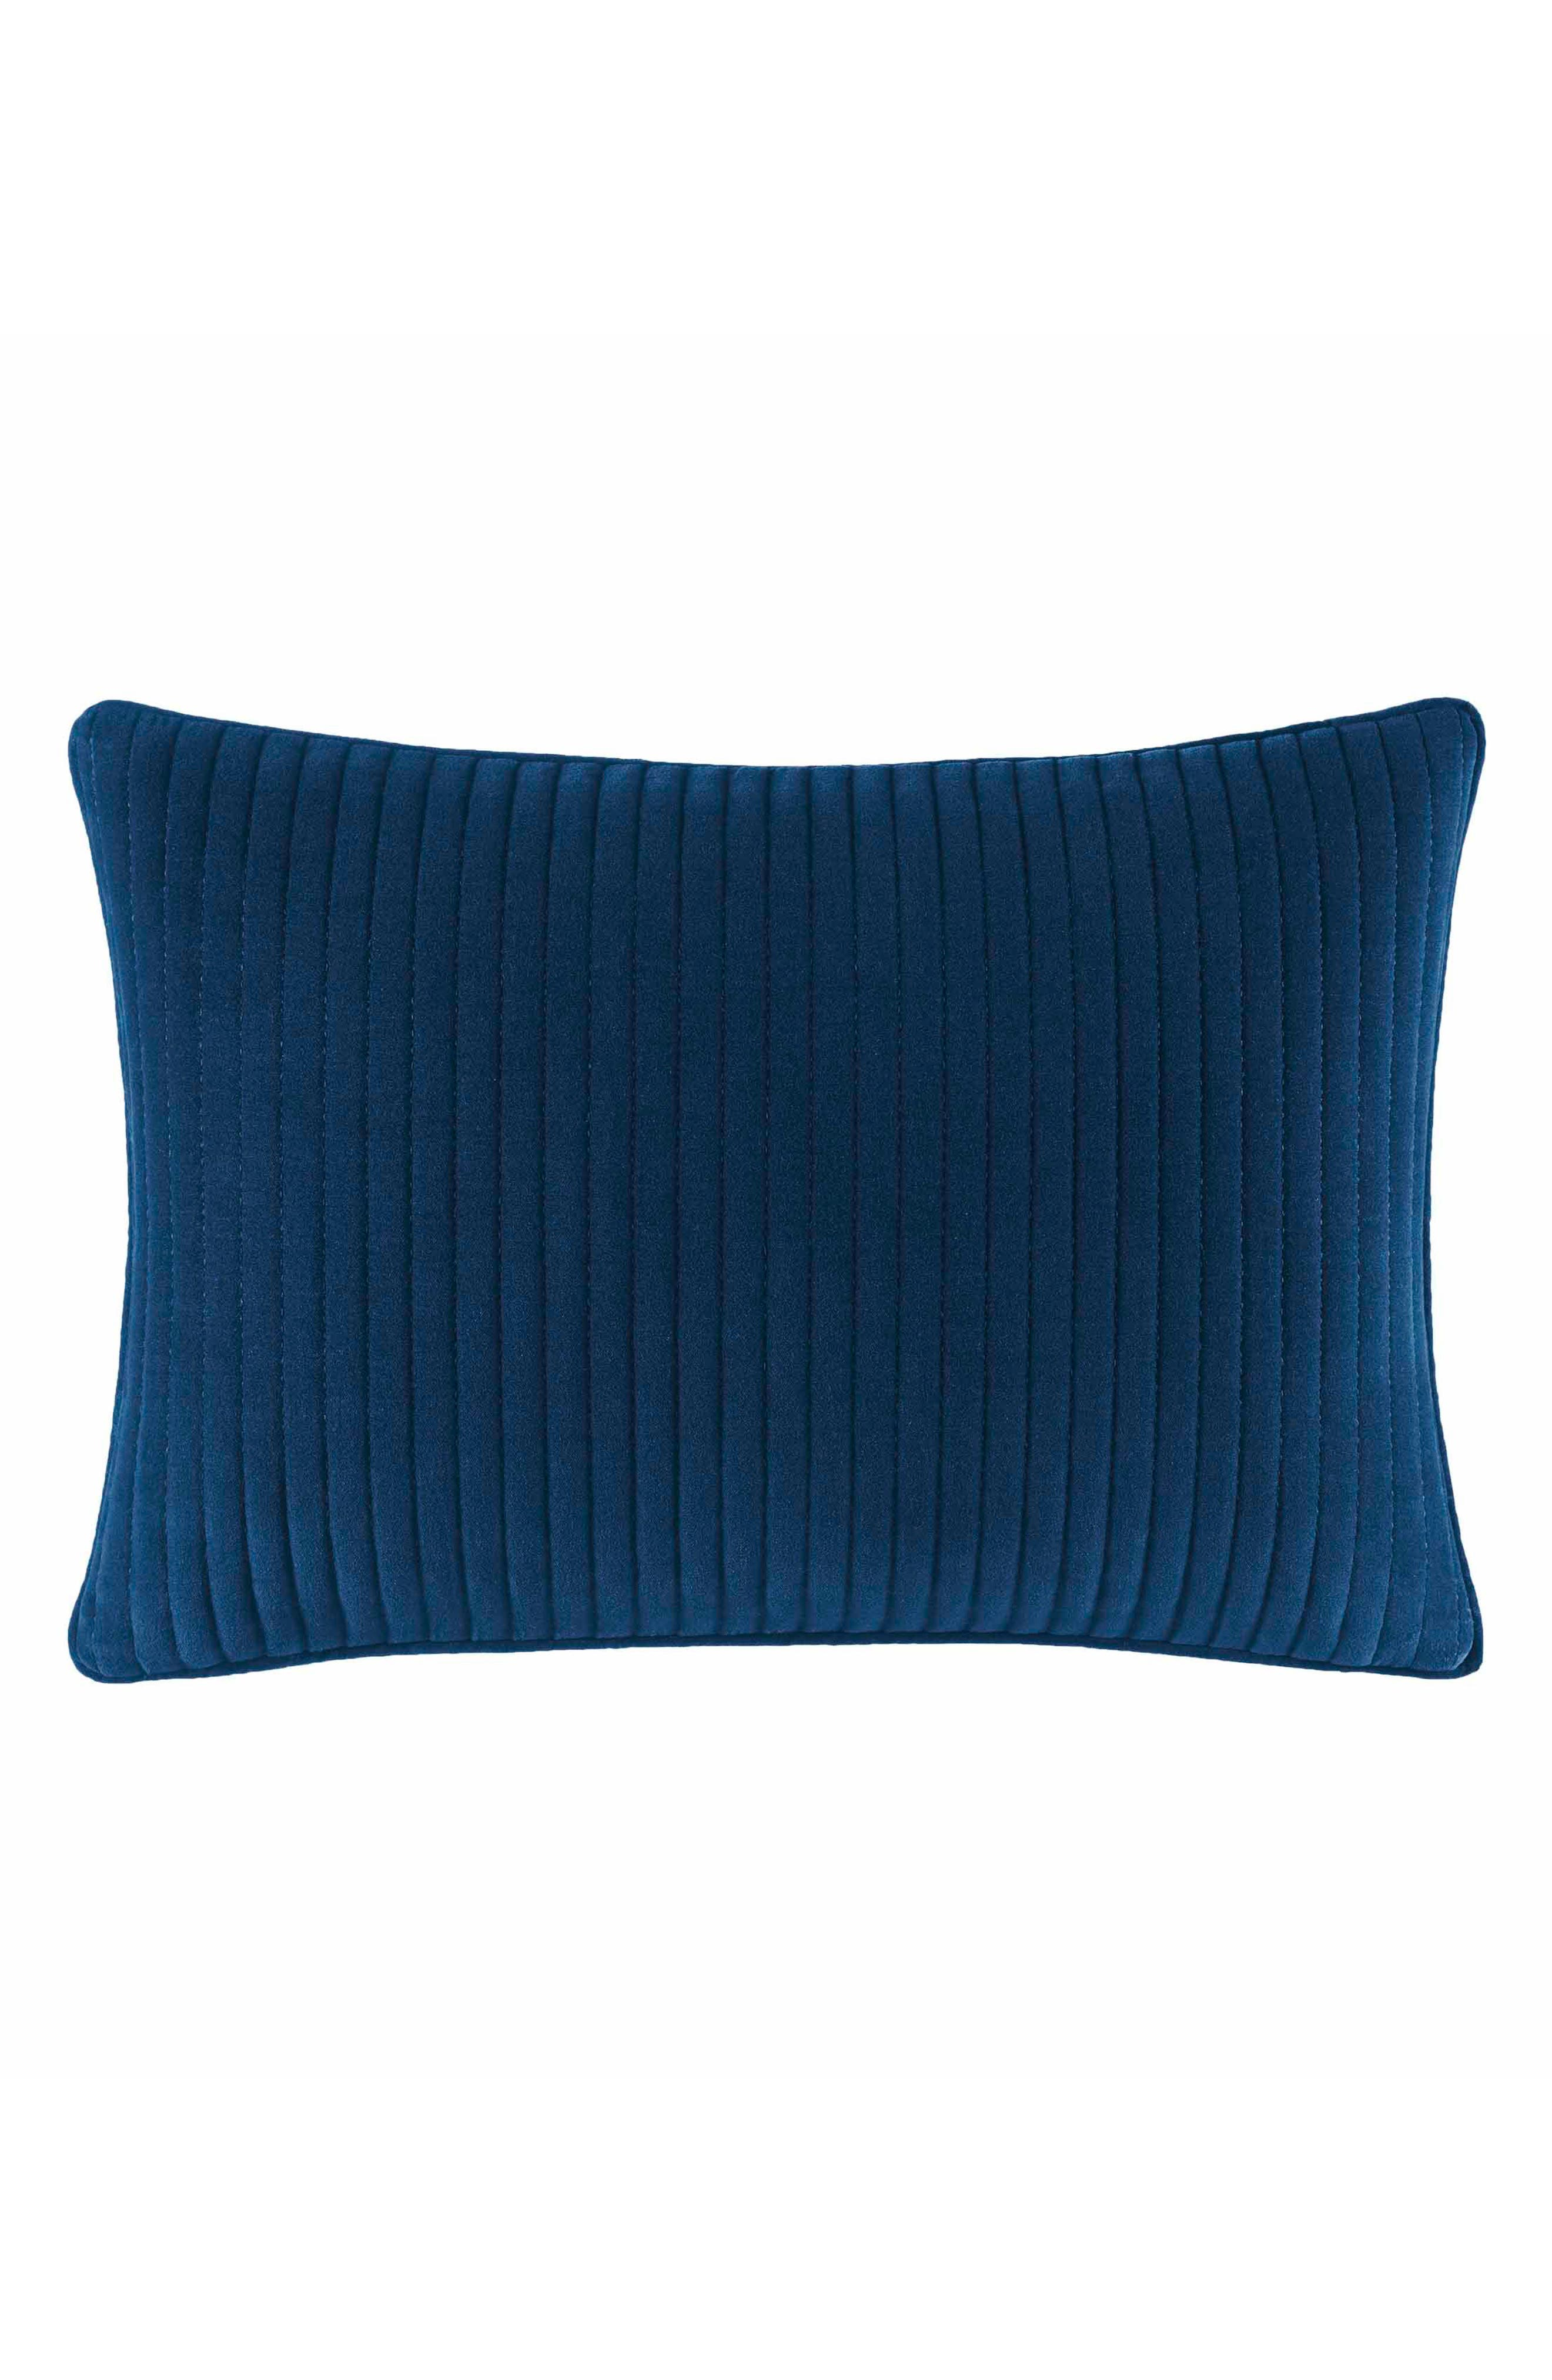 Cape Coral Pick Stitch Pillow,                         Main,                         color, 405